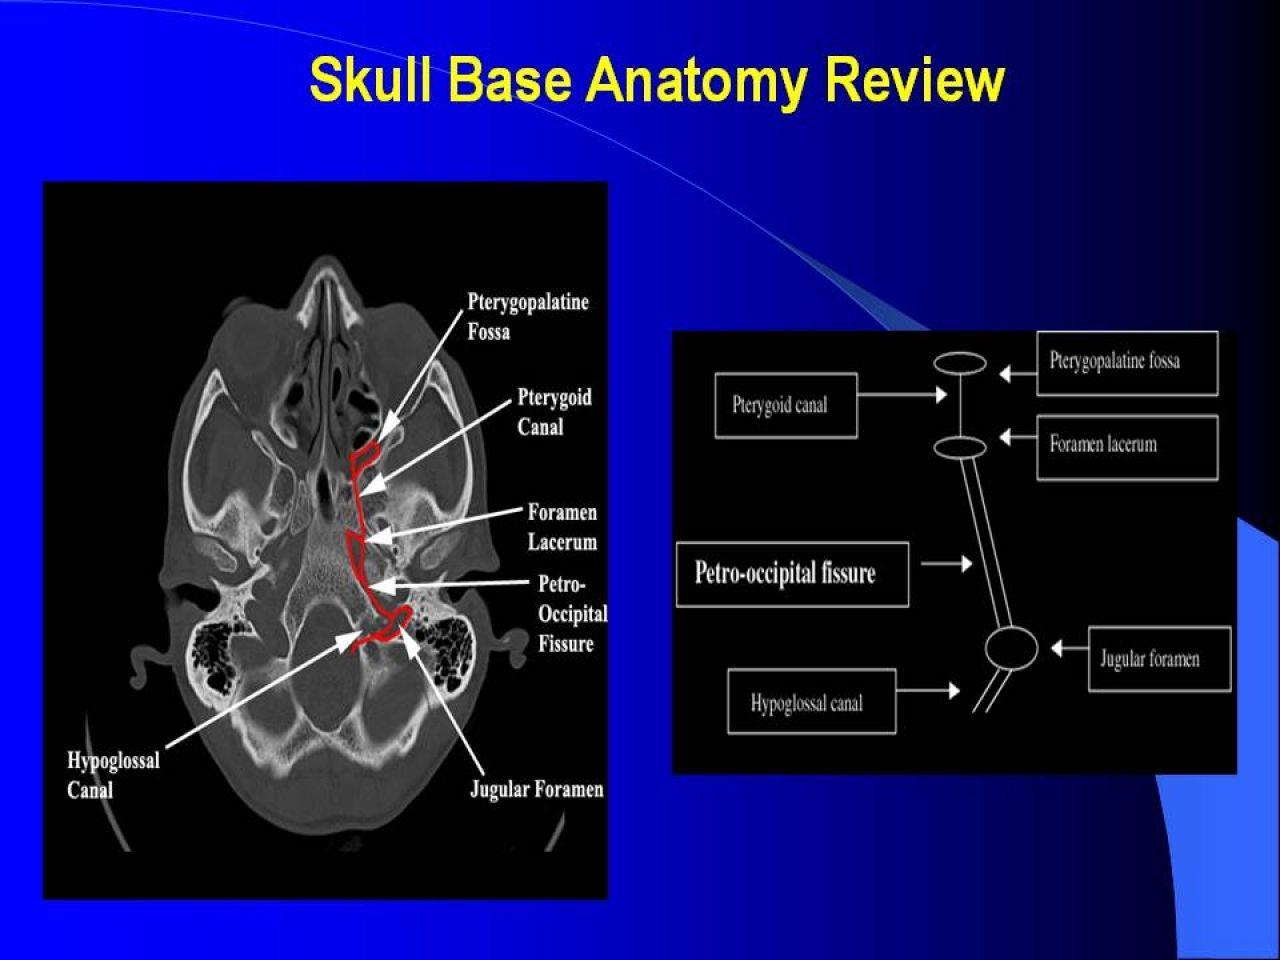 Skull Base: Review and Pathology | VEOMED | RADIOLOGY | Pinterest ...